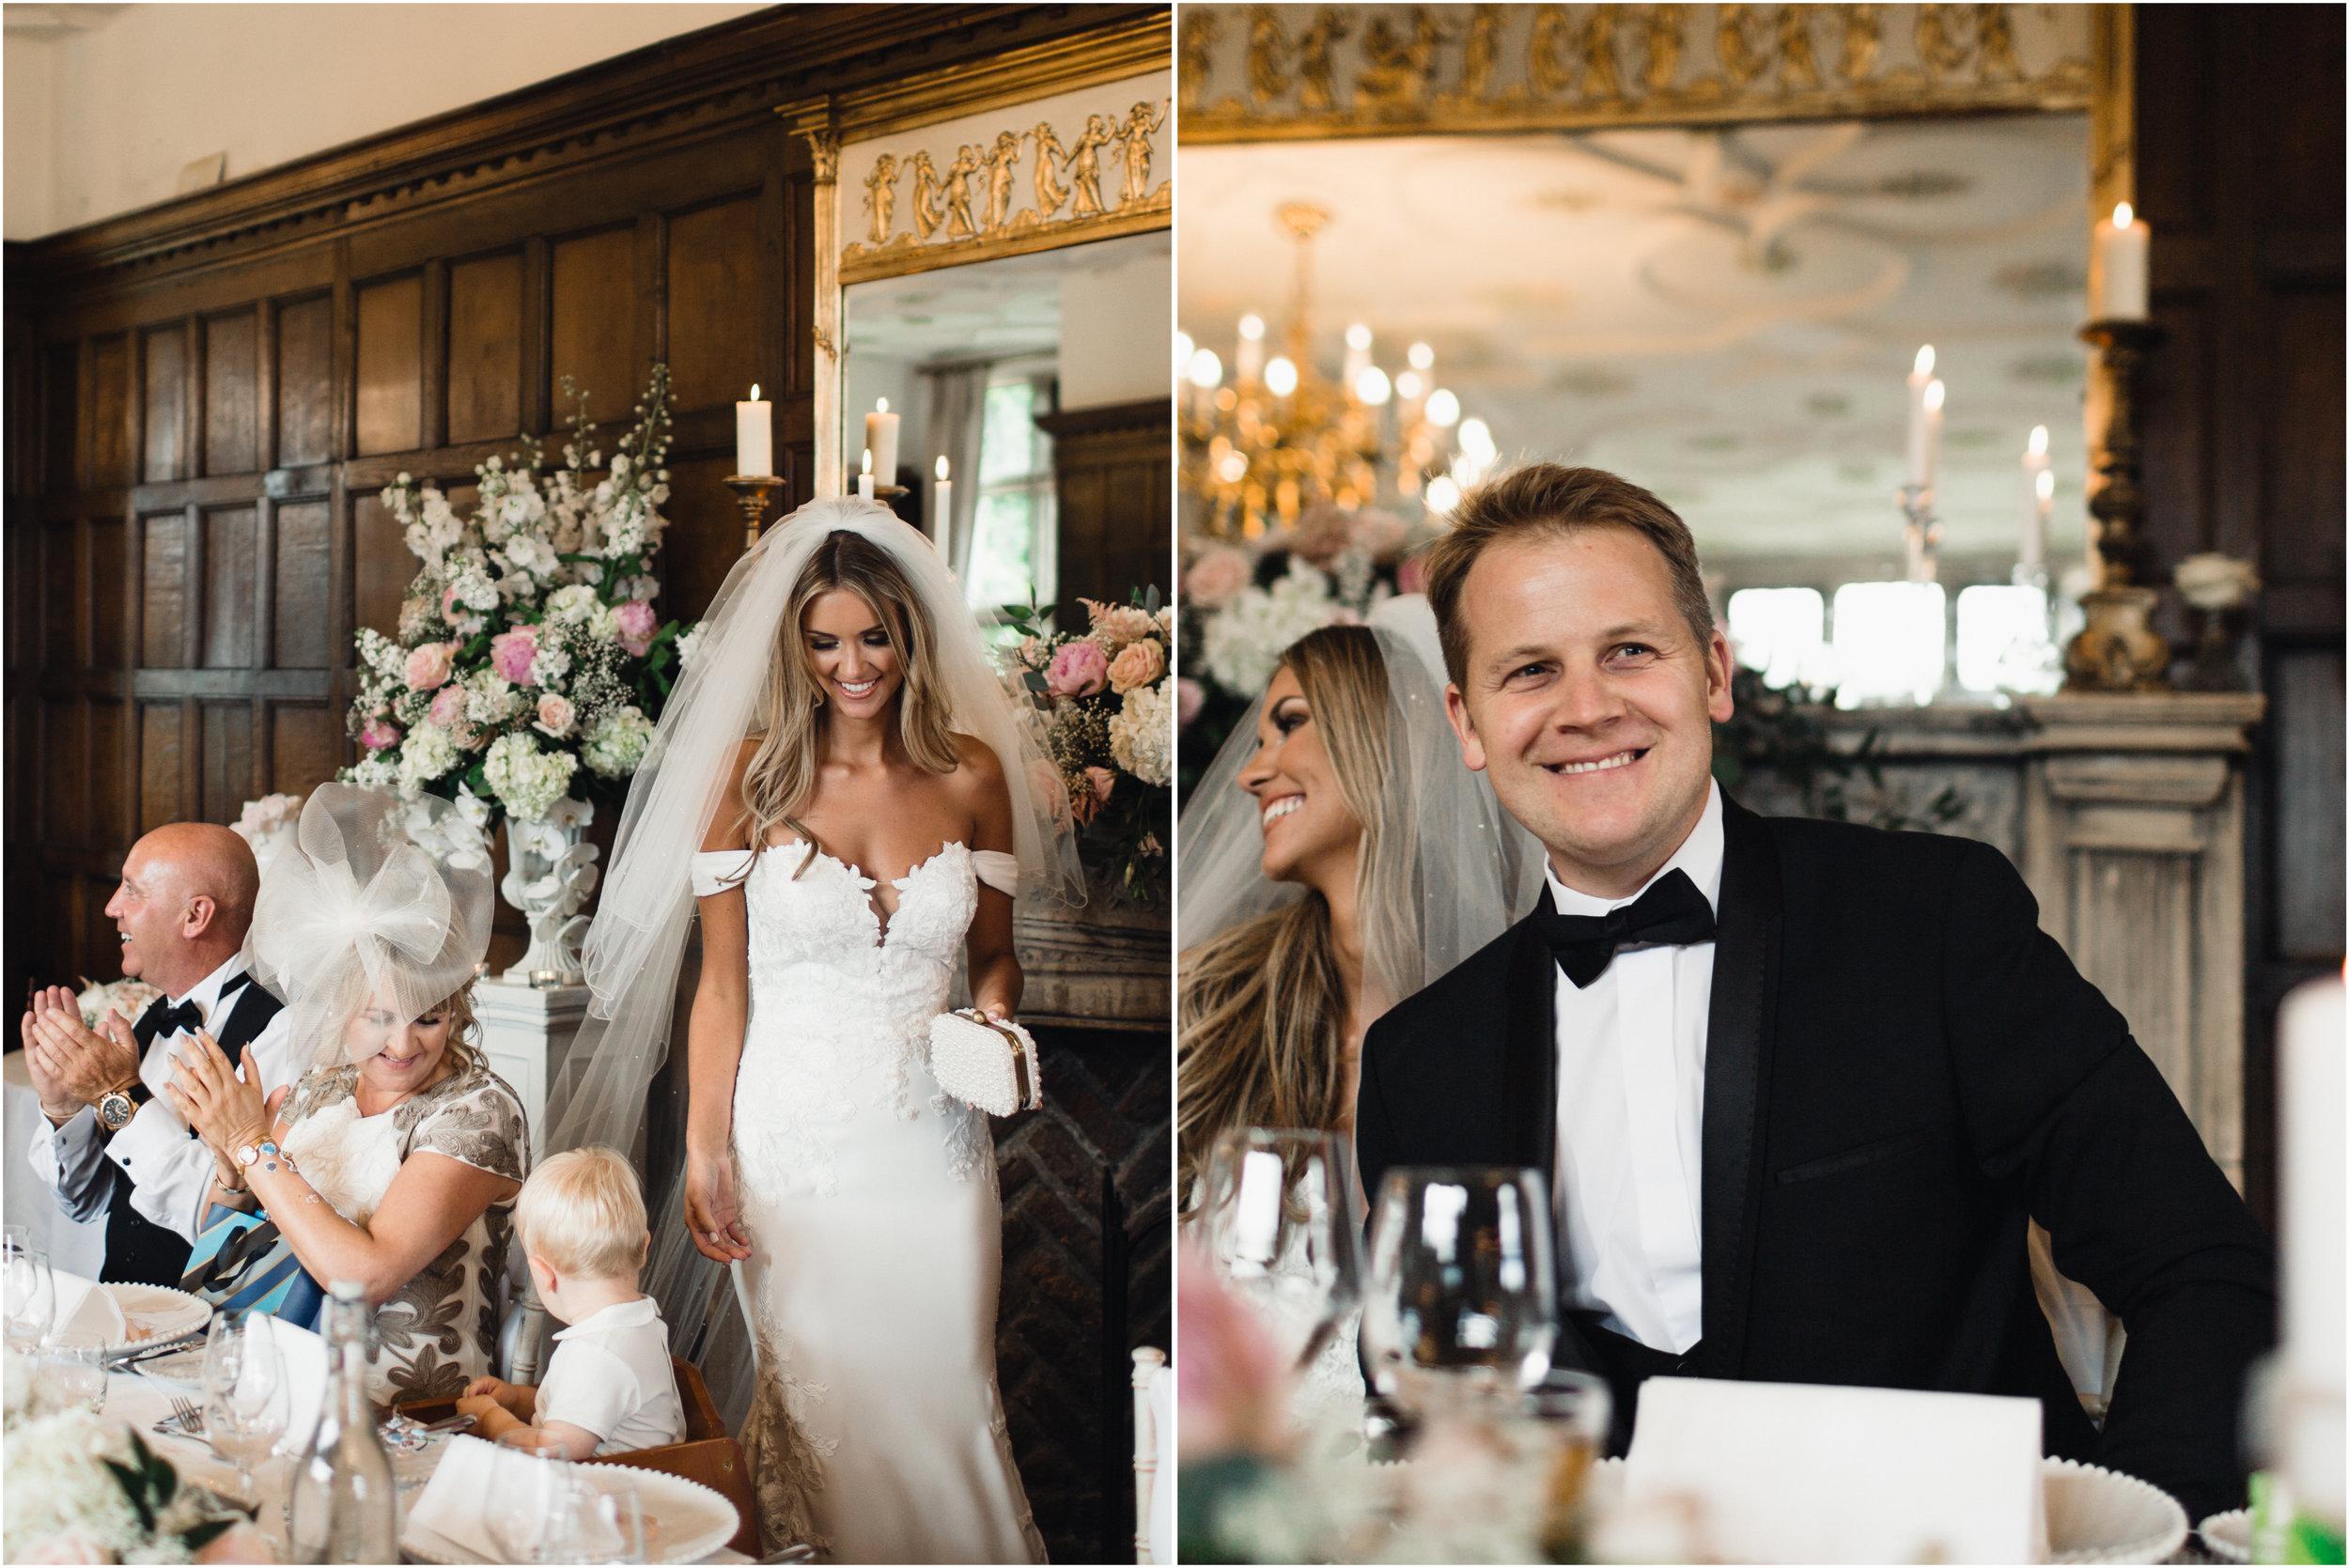 Rebecca Searle Wedding Photography Surrey London Luxury 67.jpg